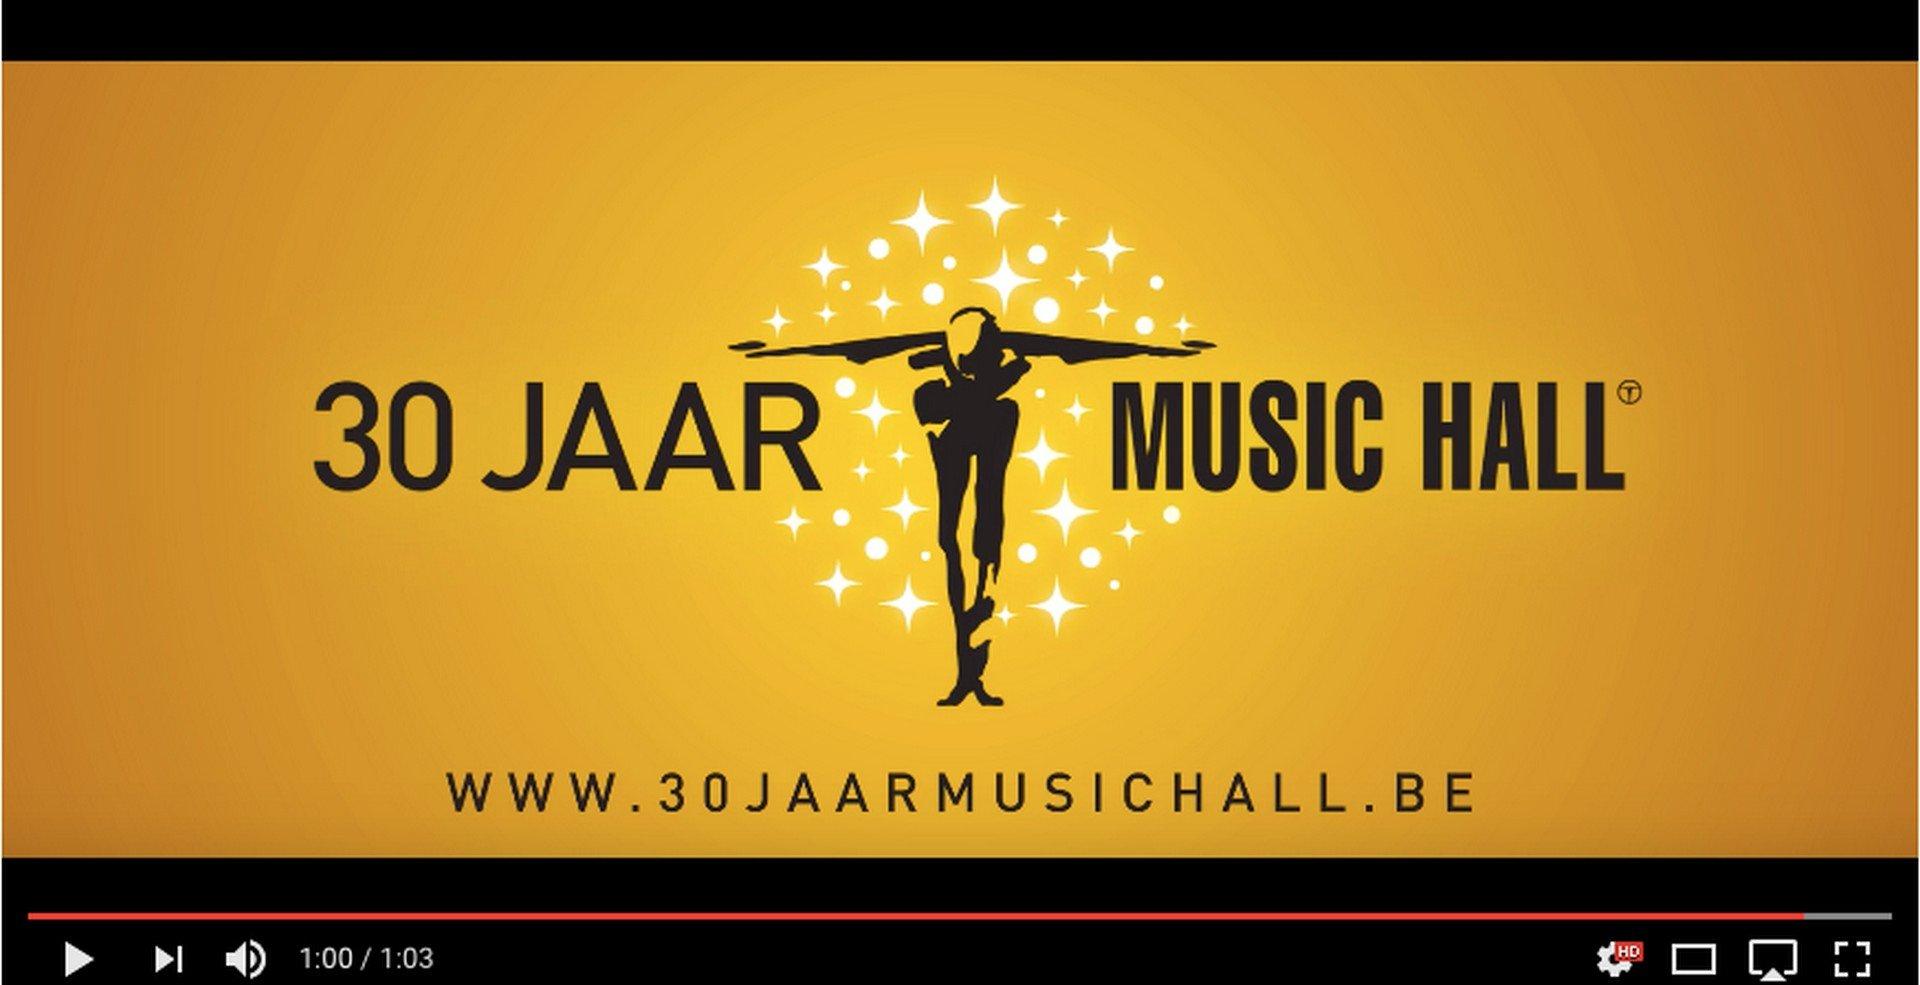 Music Hall Classics brengt prachtige balletten in seizoen 2018 - 2019 - Logo Music Hall 30 jaar